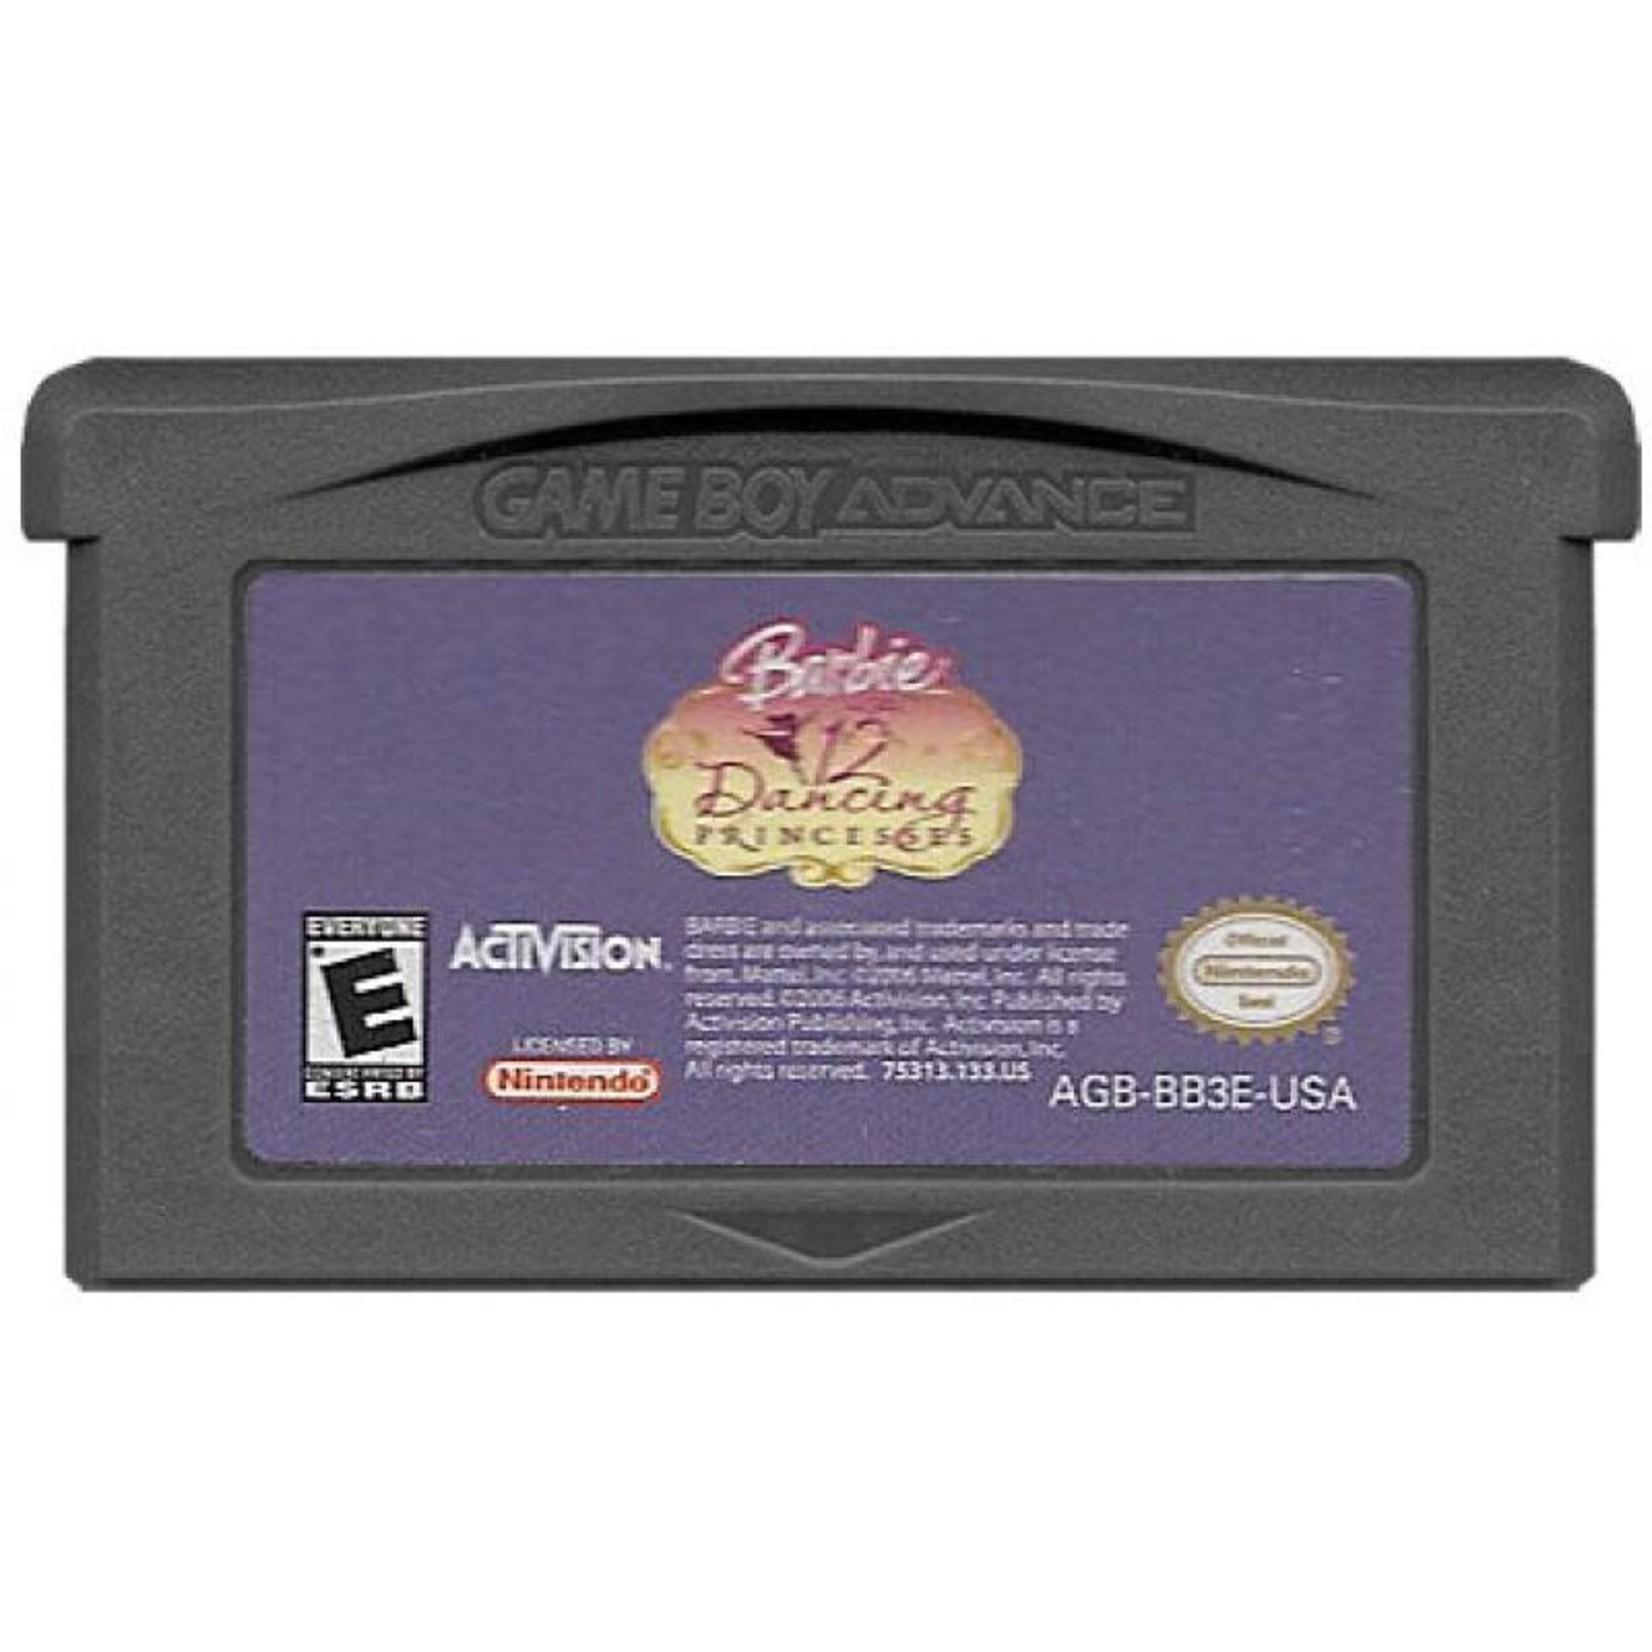 gbau-Barbie 12 dancing Princesses (cartridge)